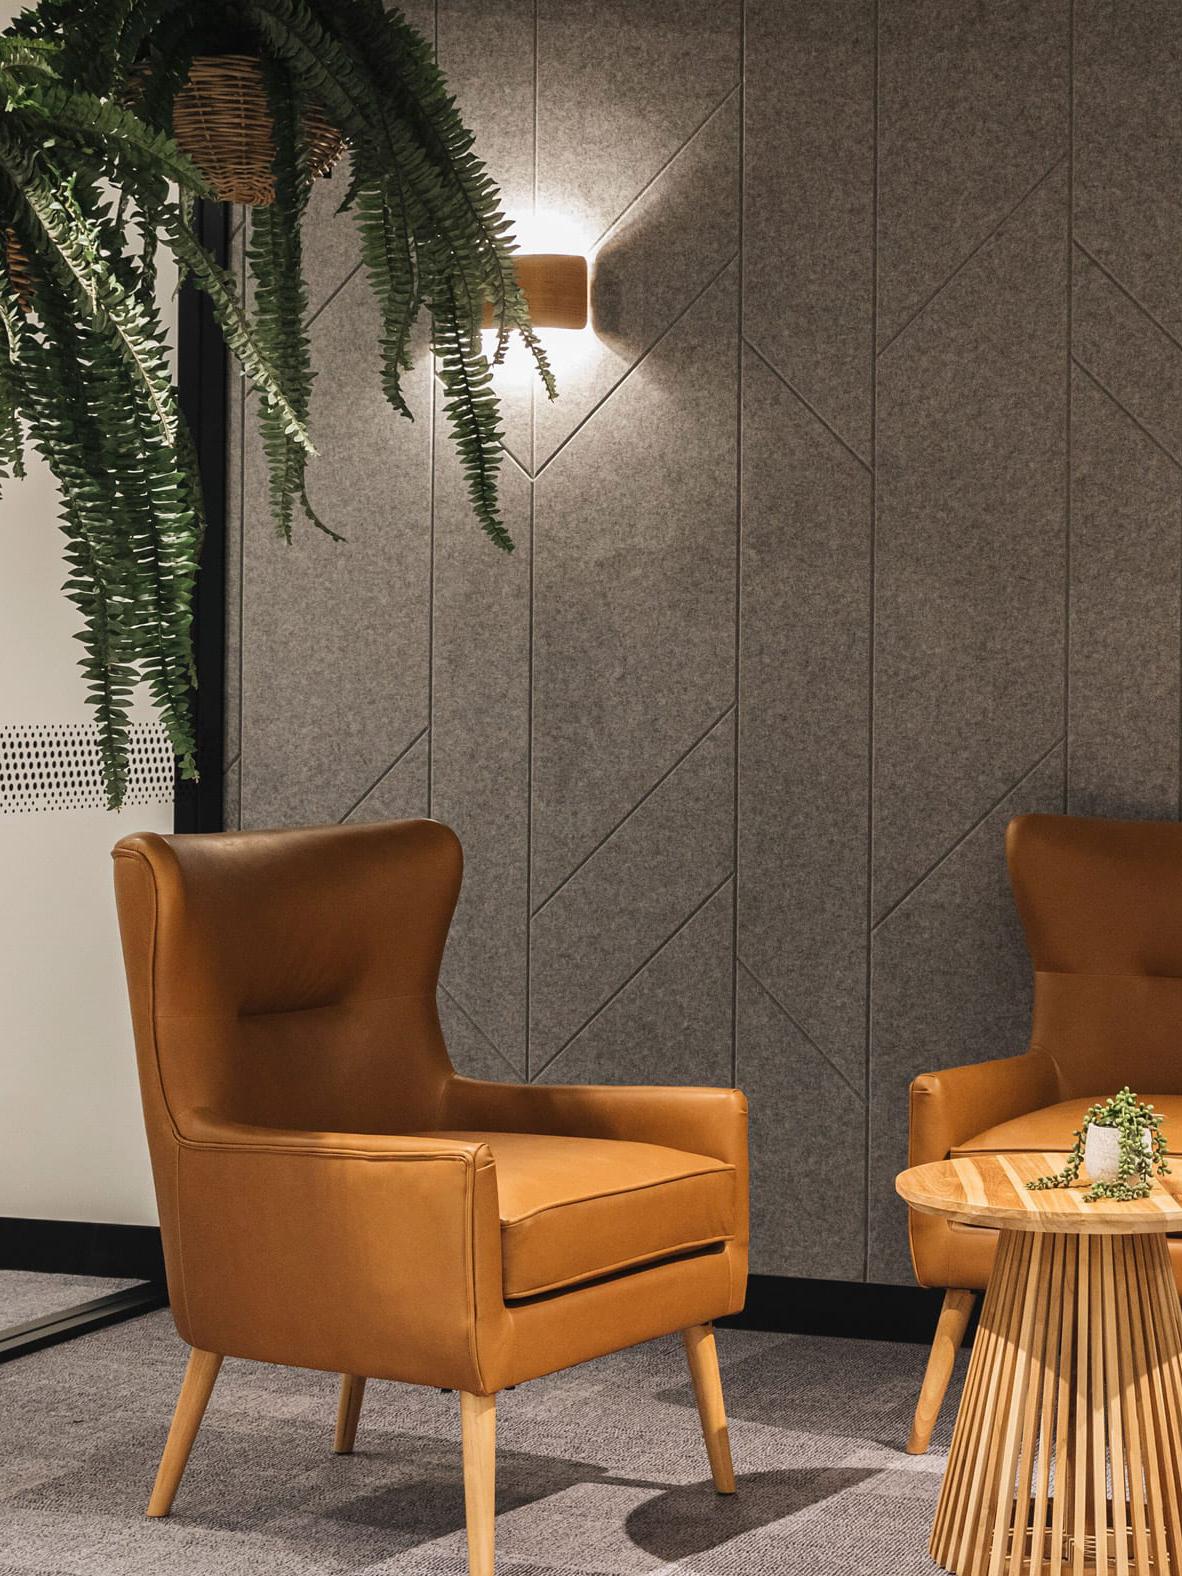 《Autex Acoustics》2021春夏瓷砖系列Lookbook